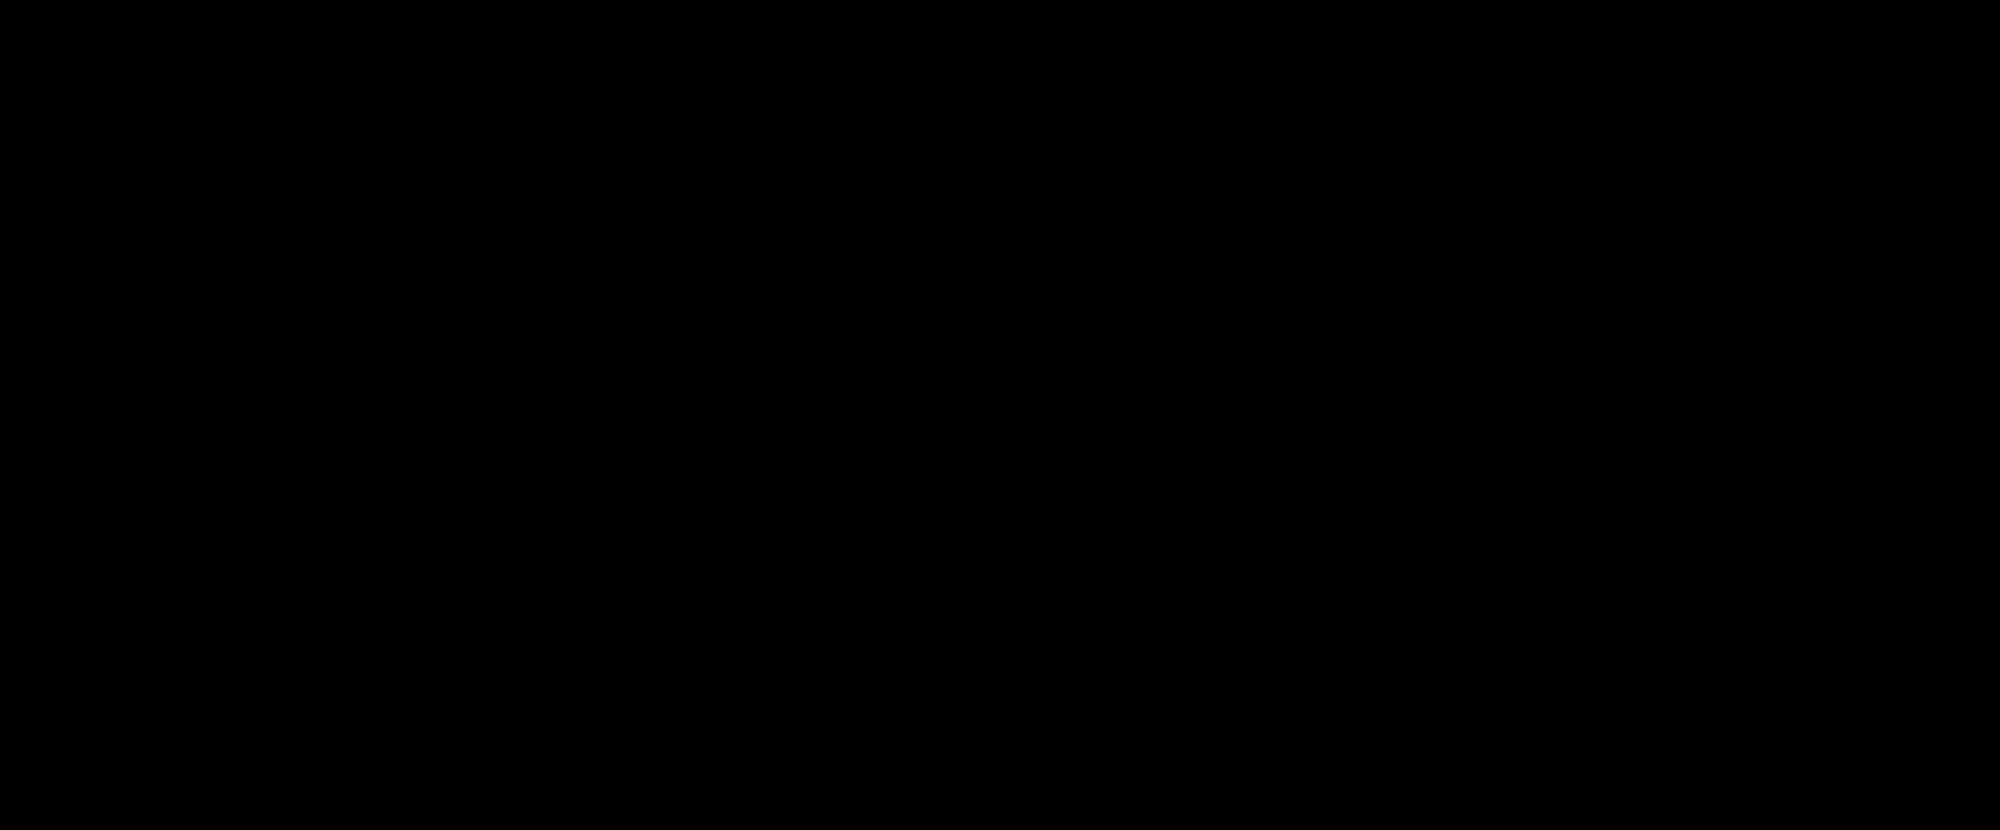 Grid Animation